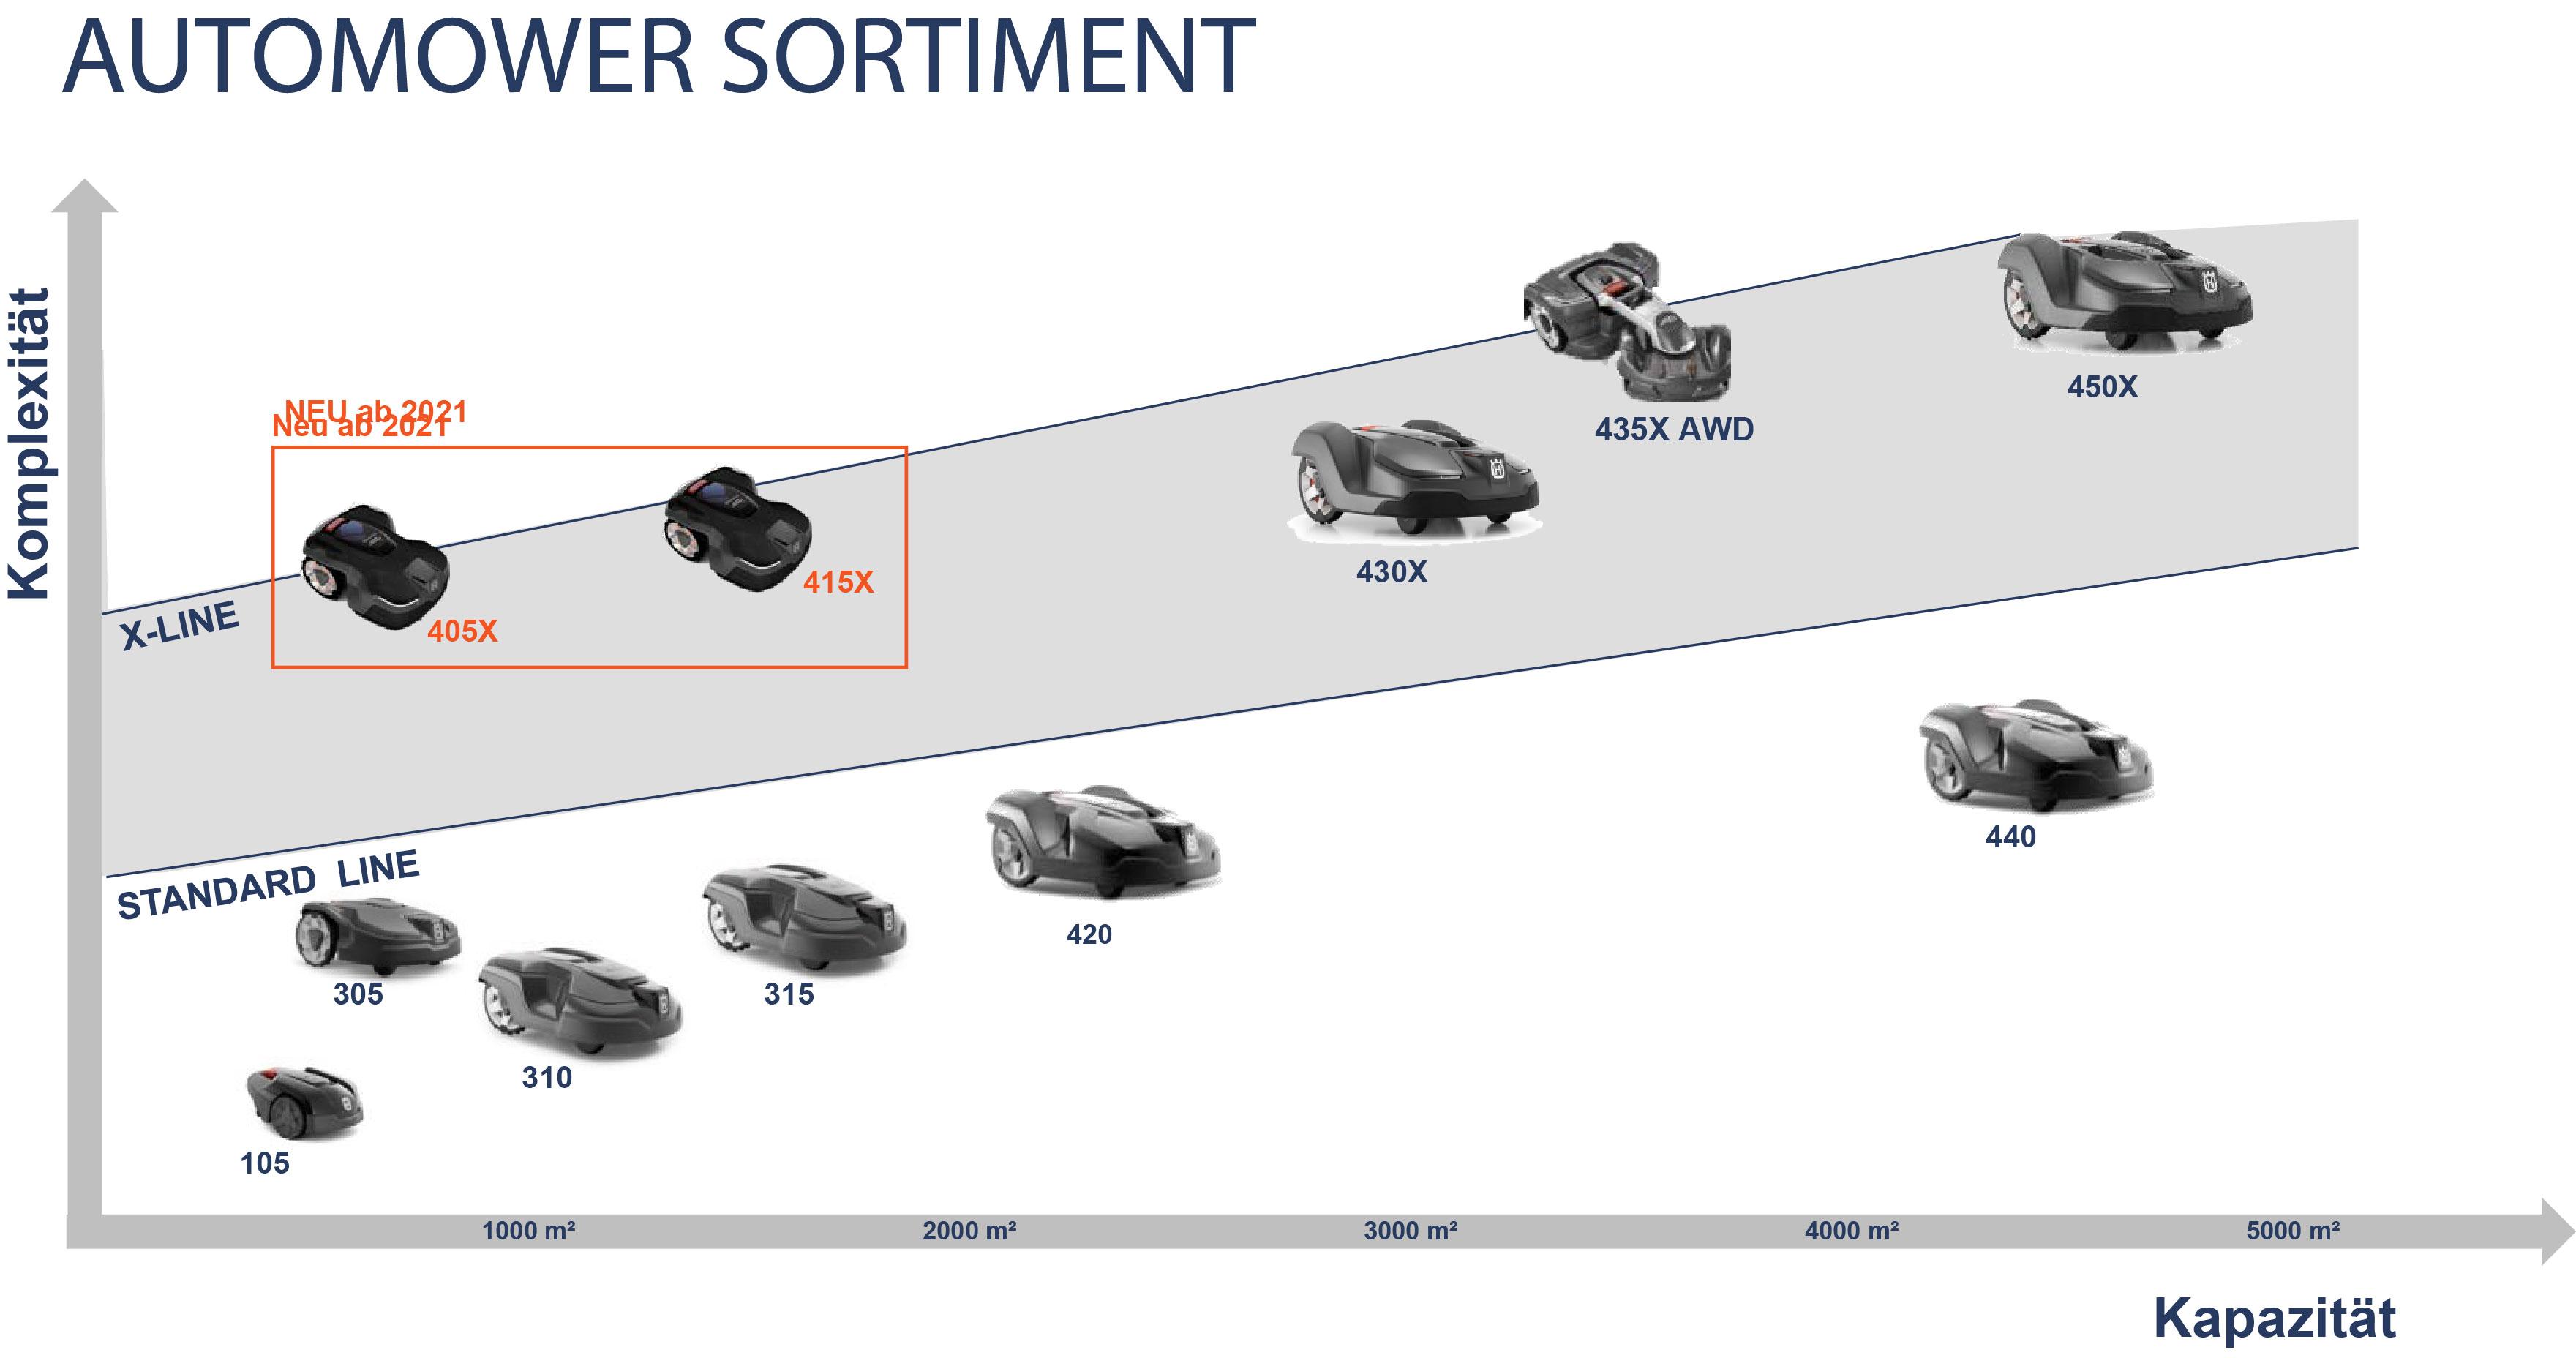 husqvarna-automower-sortiment-2021